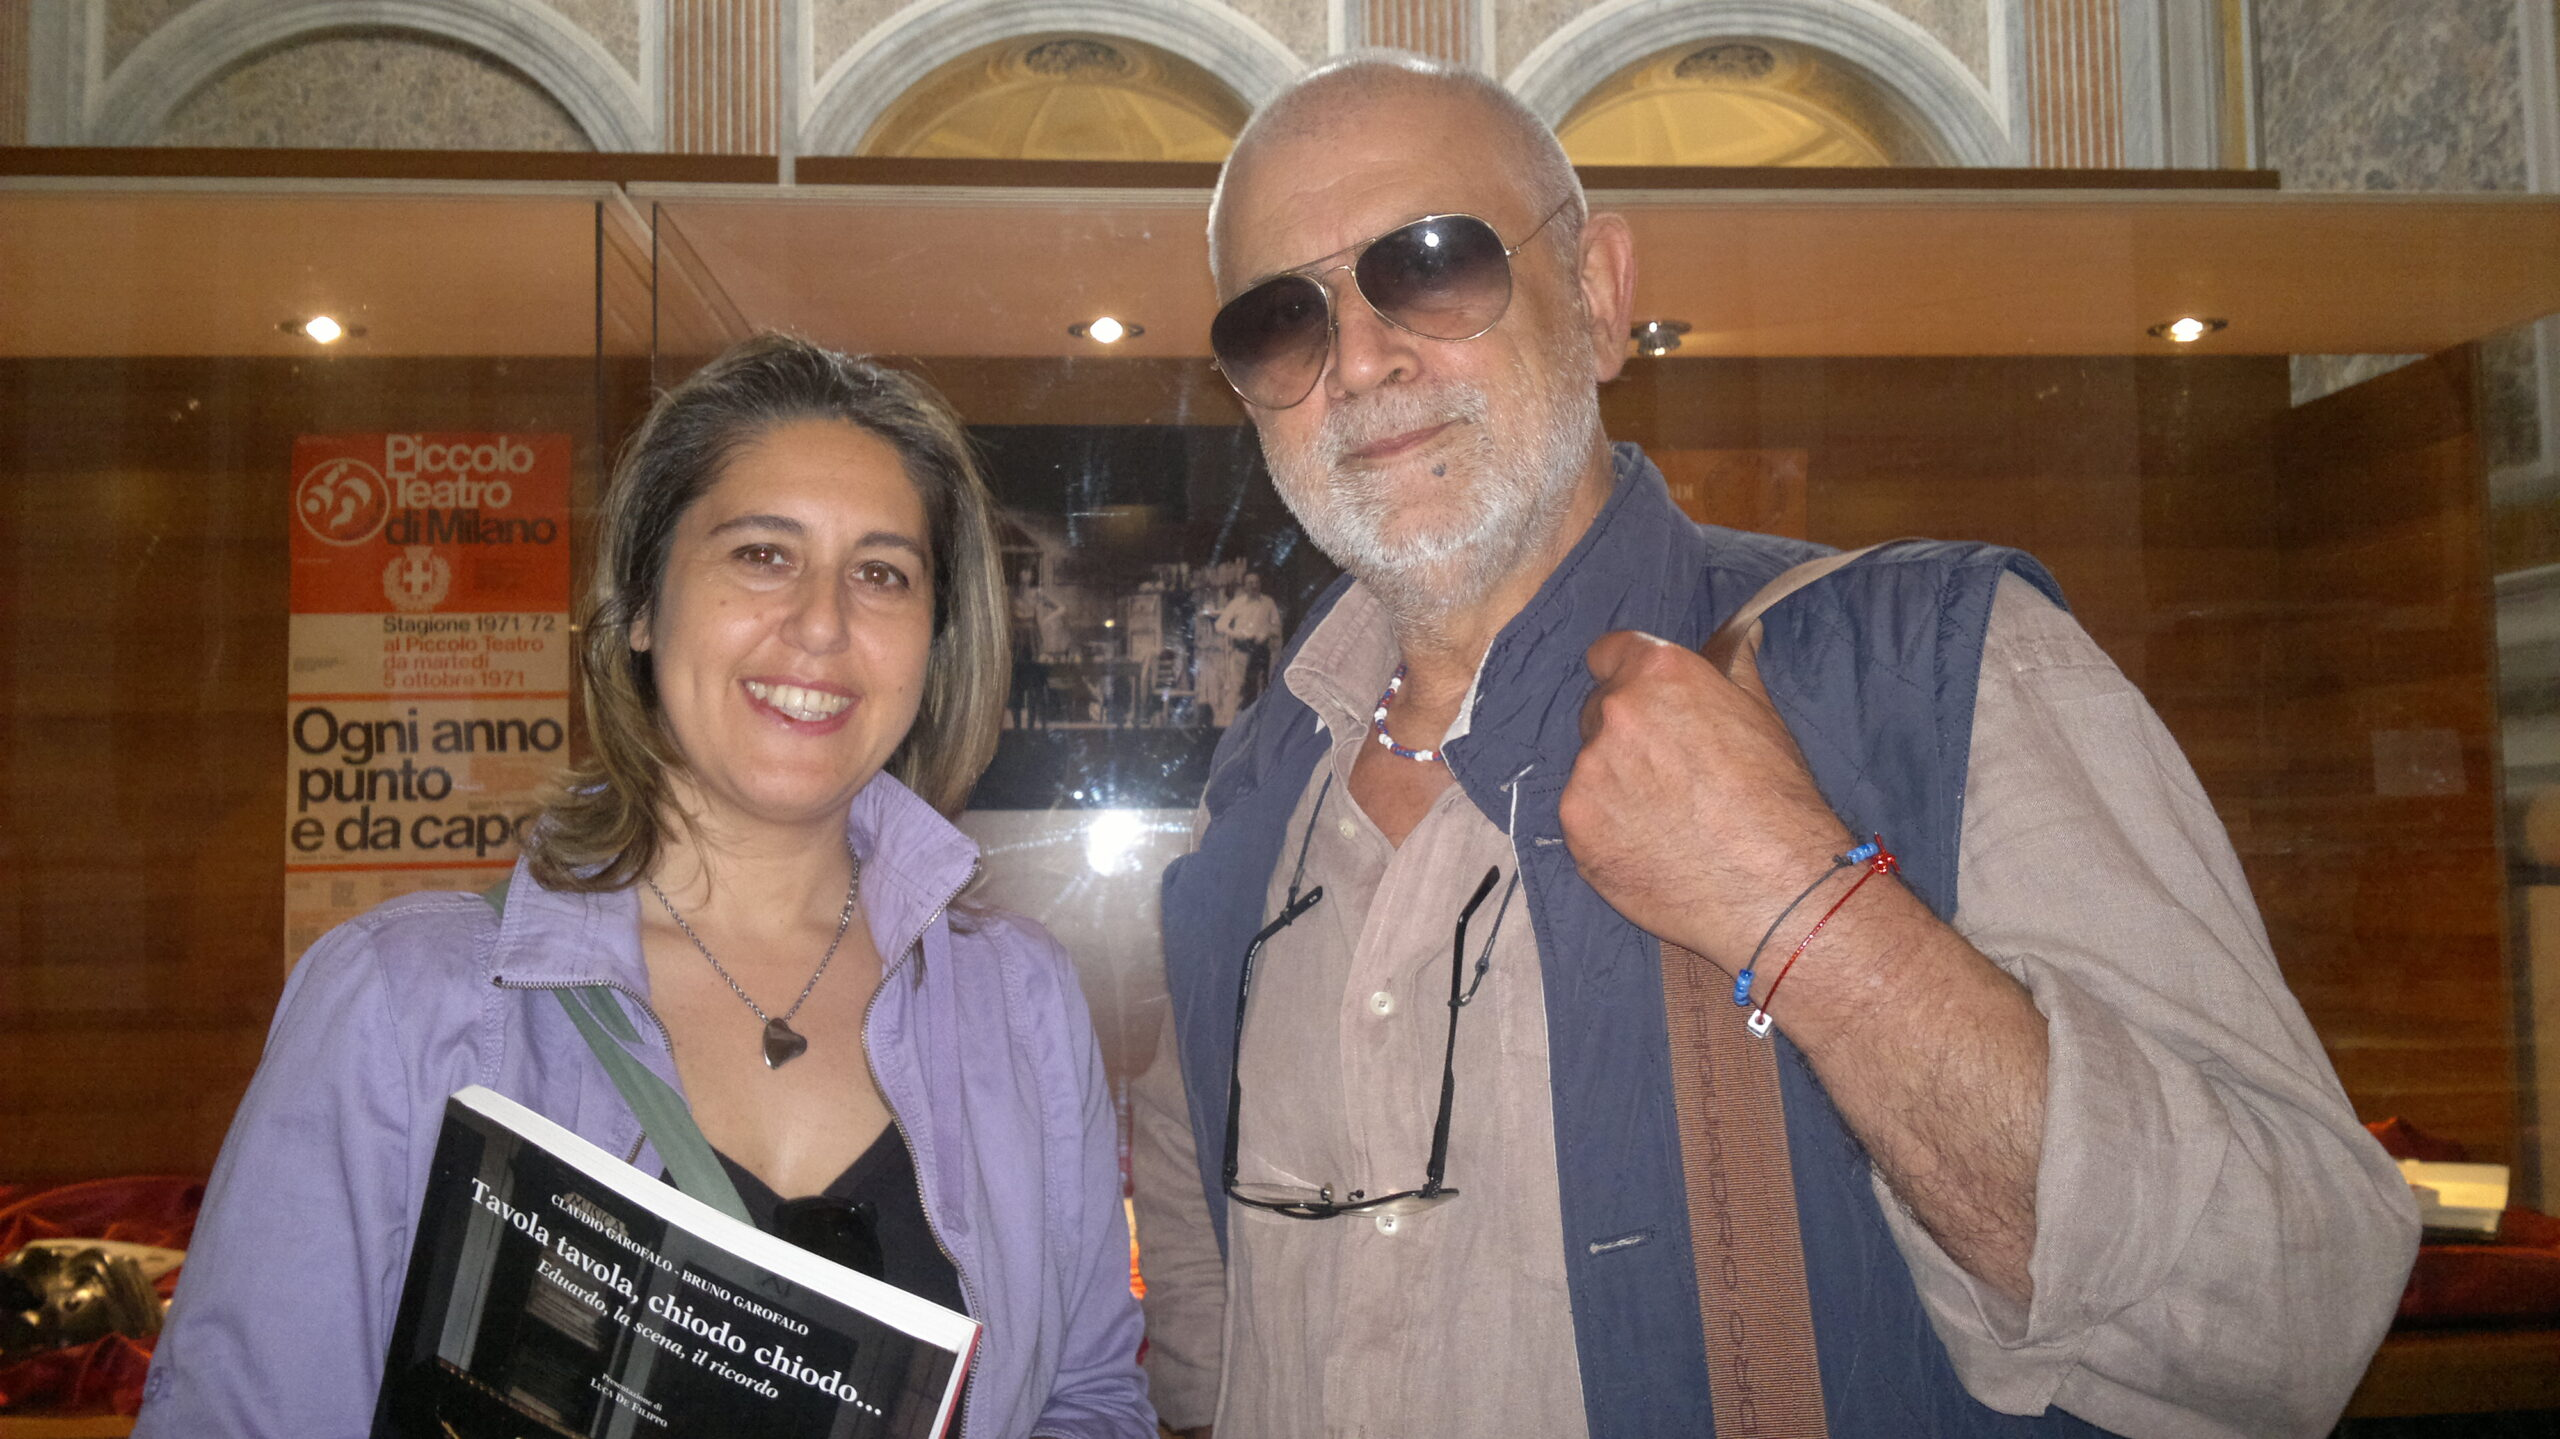 21 giugno 2014 -Maria Rosaria Voccia e Bruno Garofalo